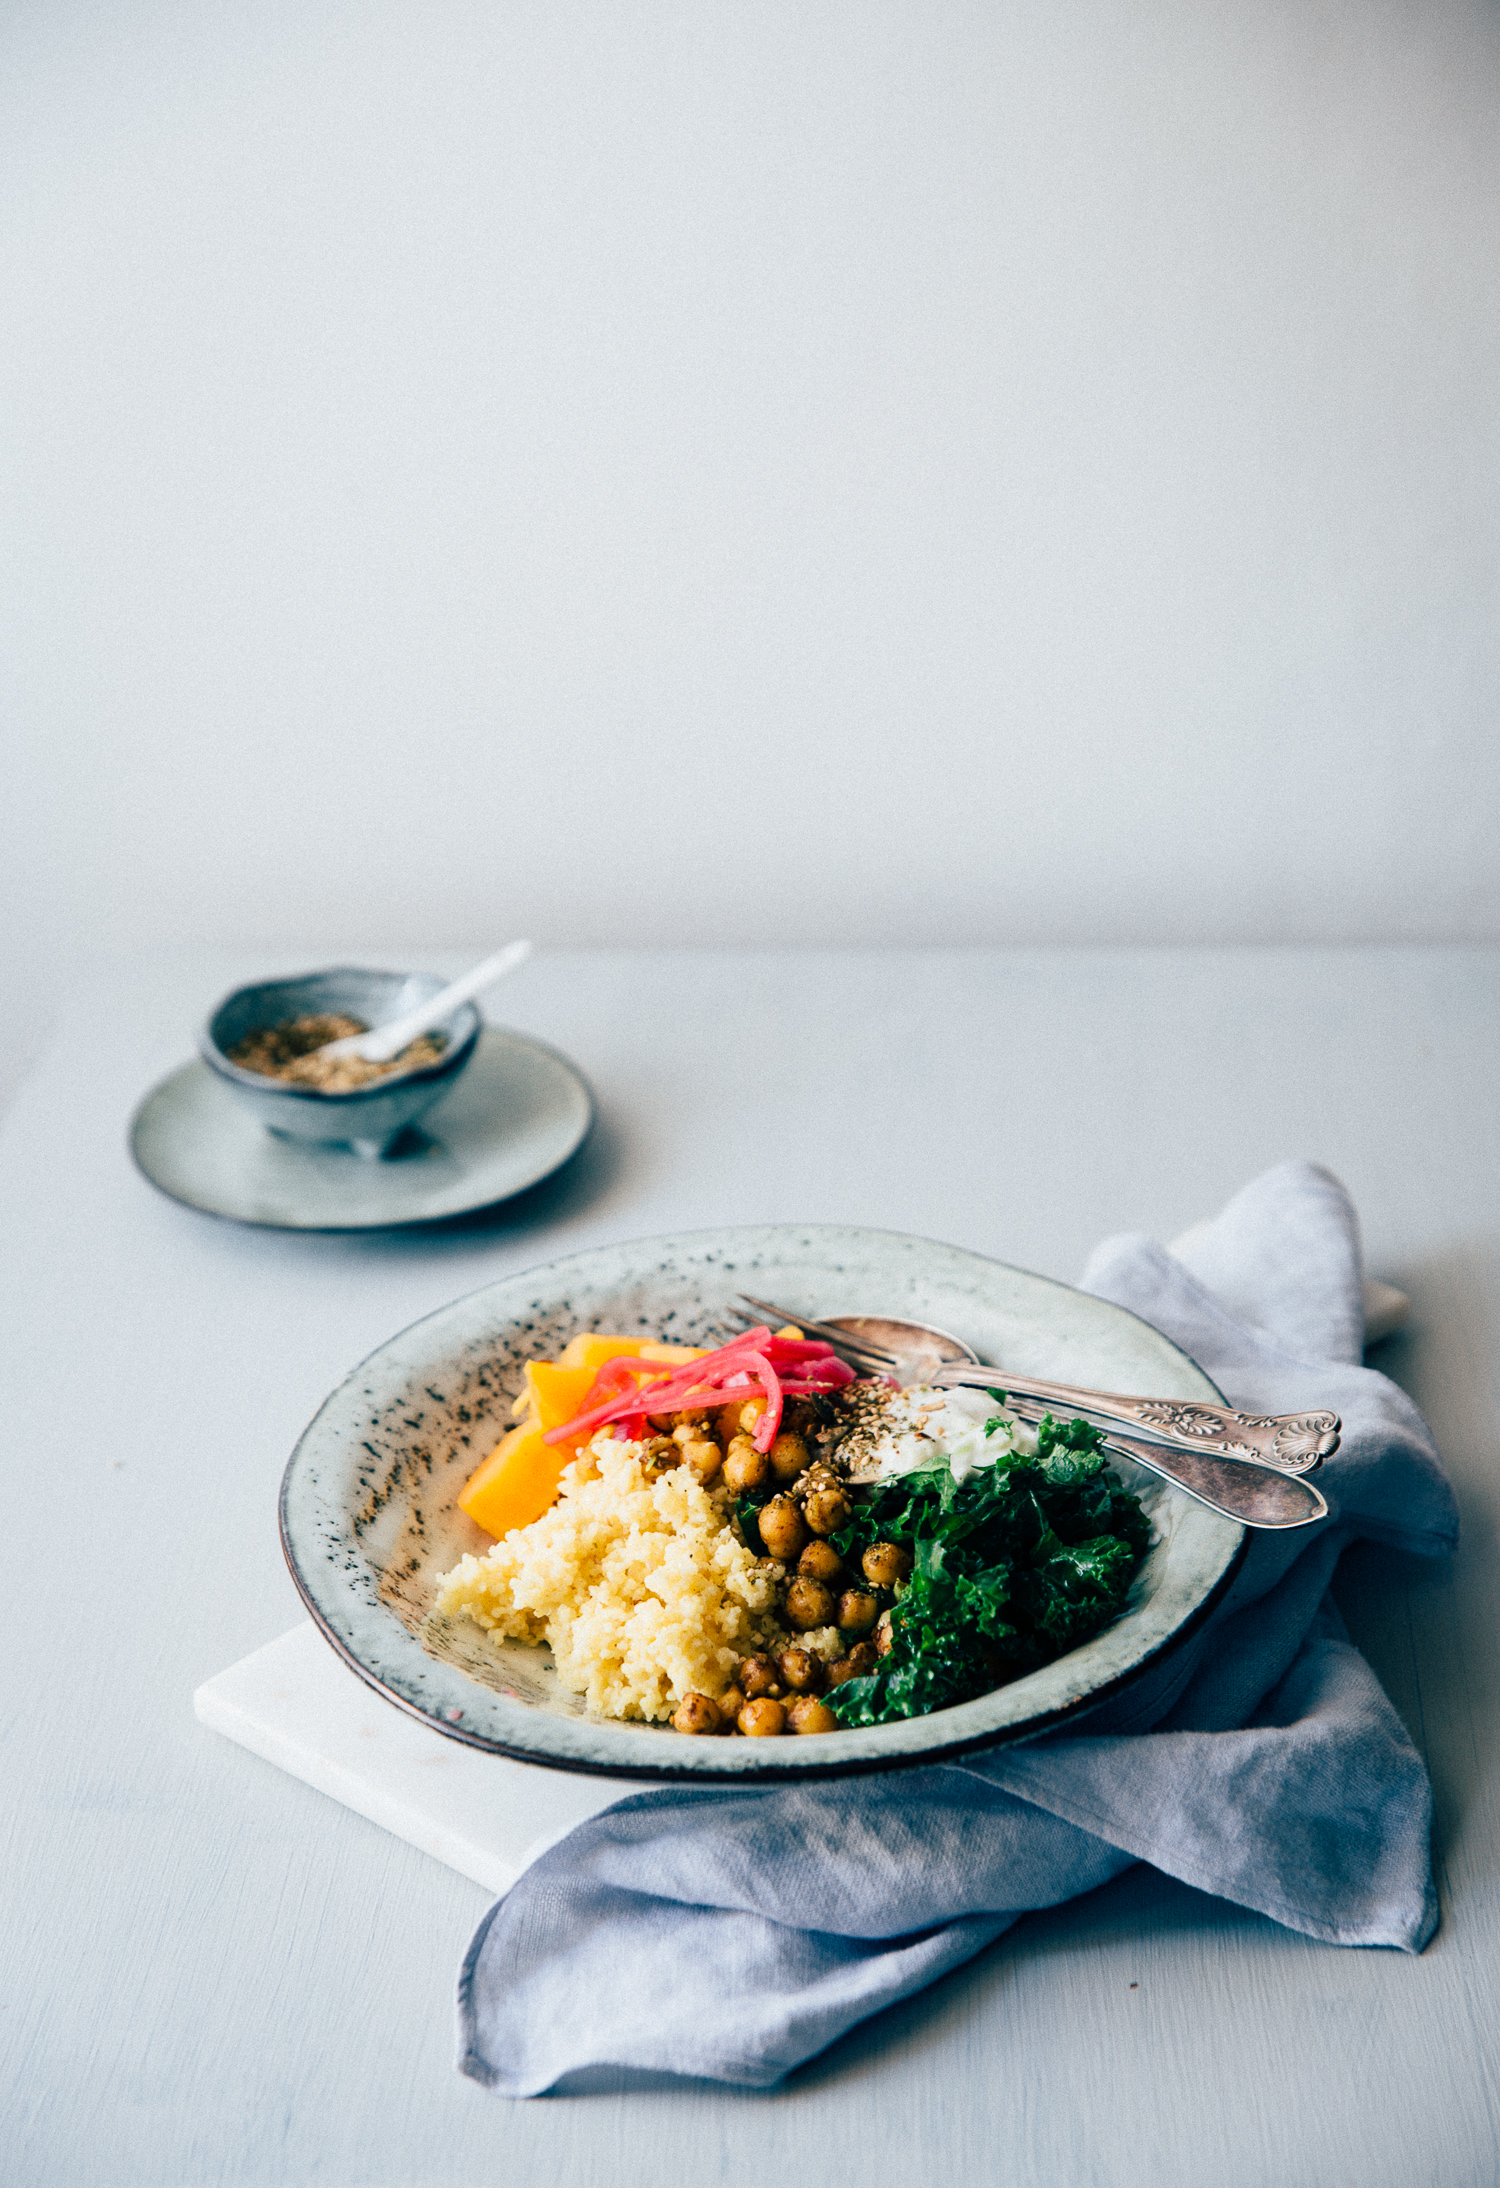 Hippie Bowl with Spicy Chickpea, Millet & Sweet Potato   Cashew Kitchen